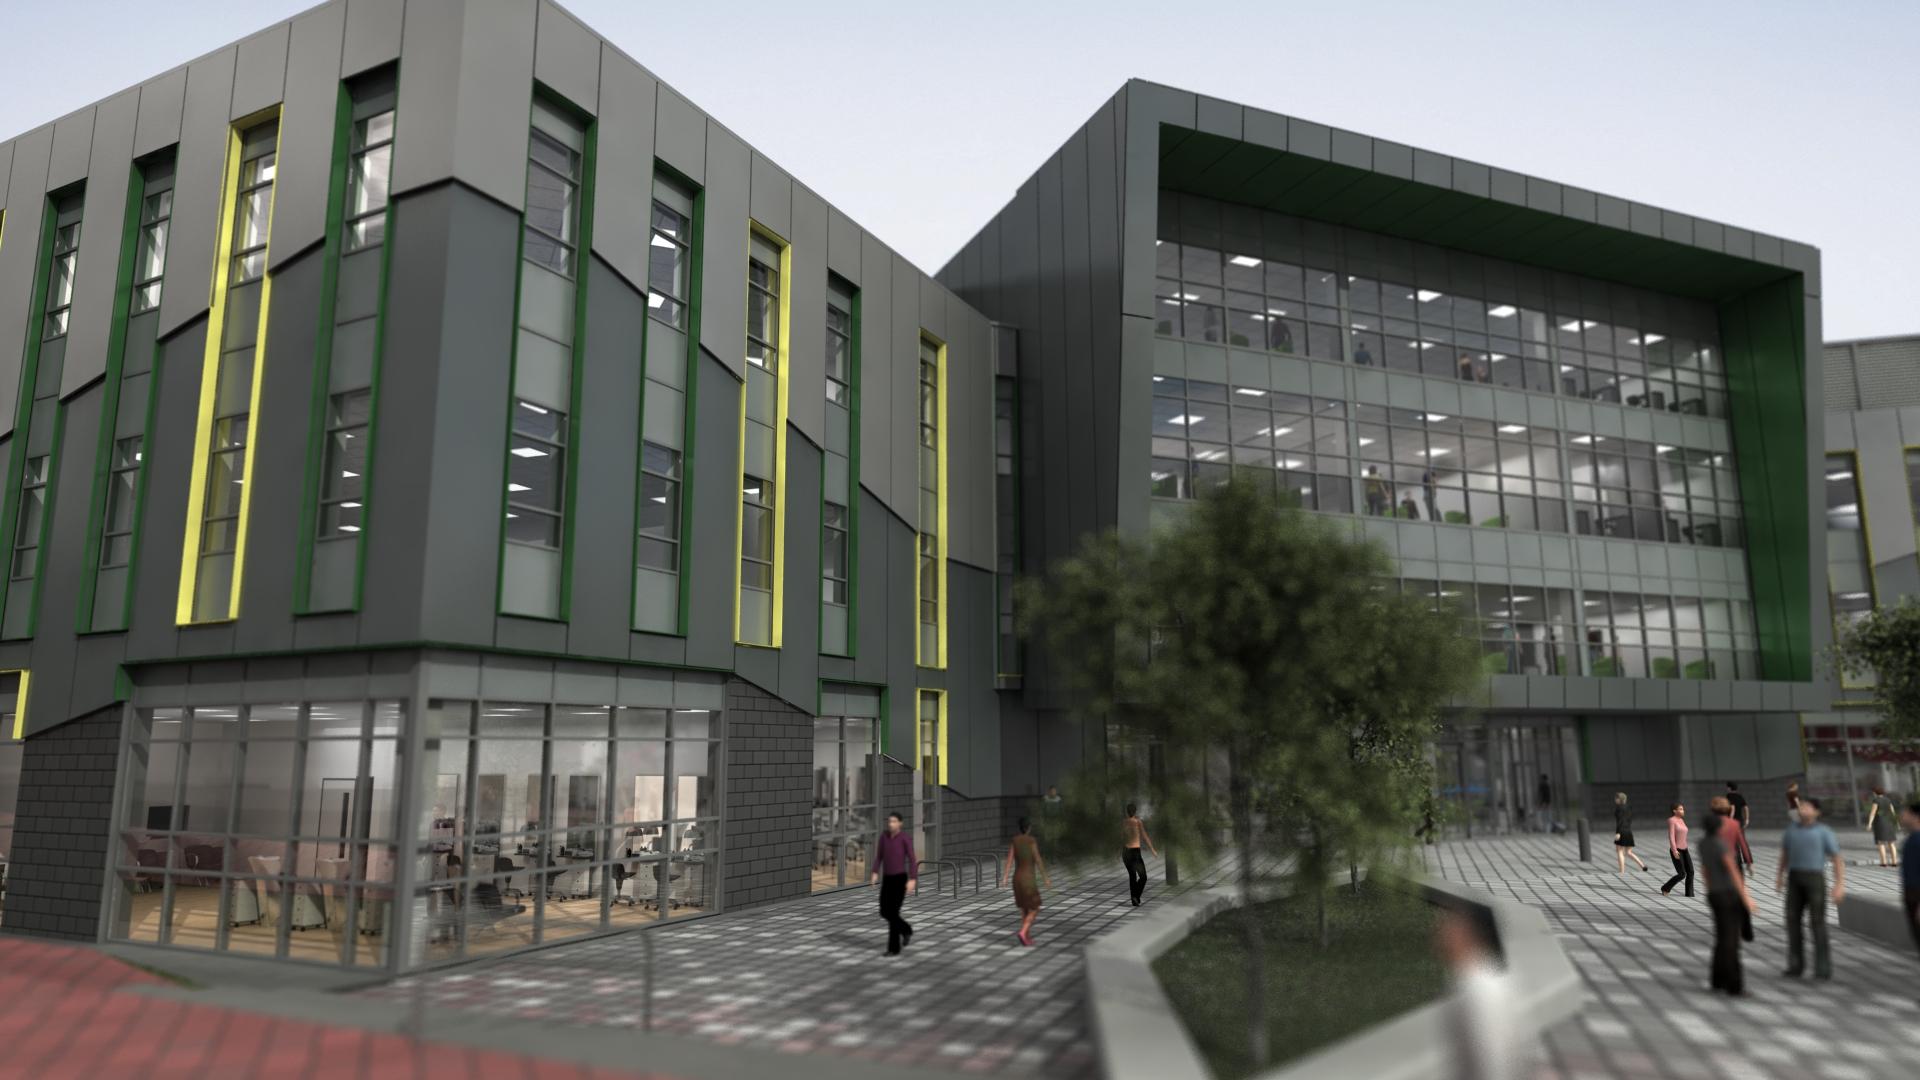 South Essex College Architectural 3D Render-05.jpg